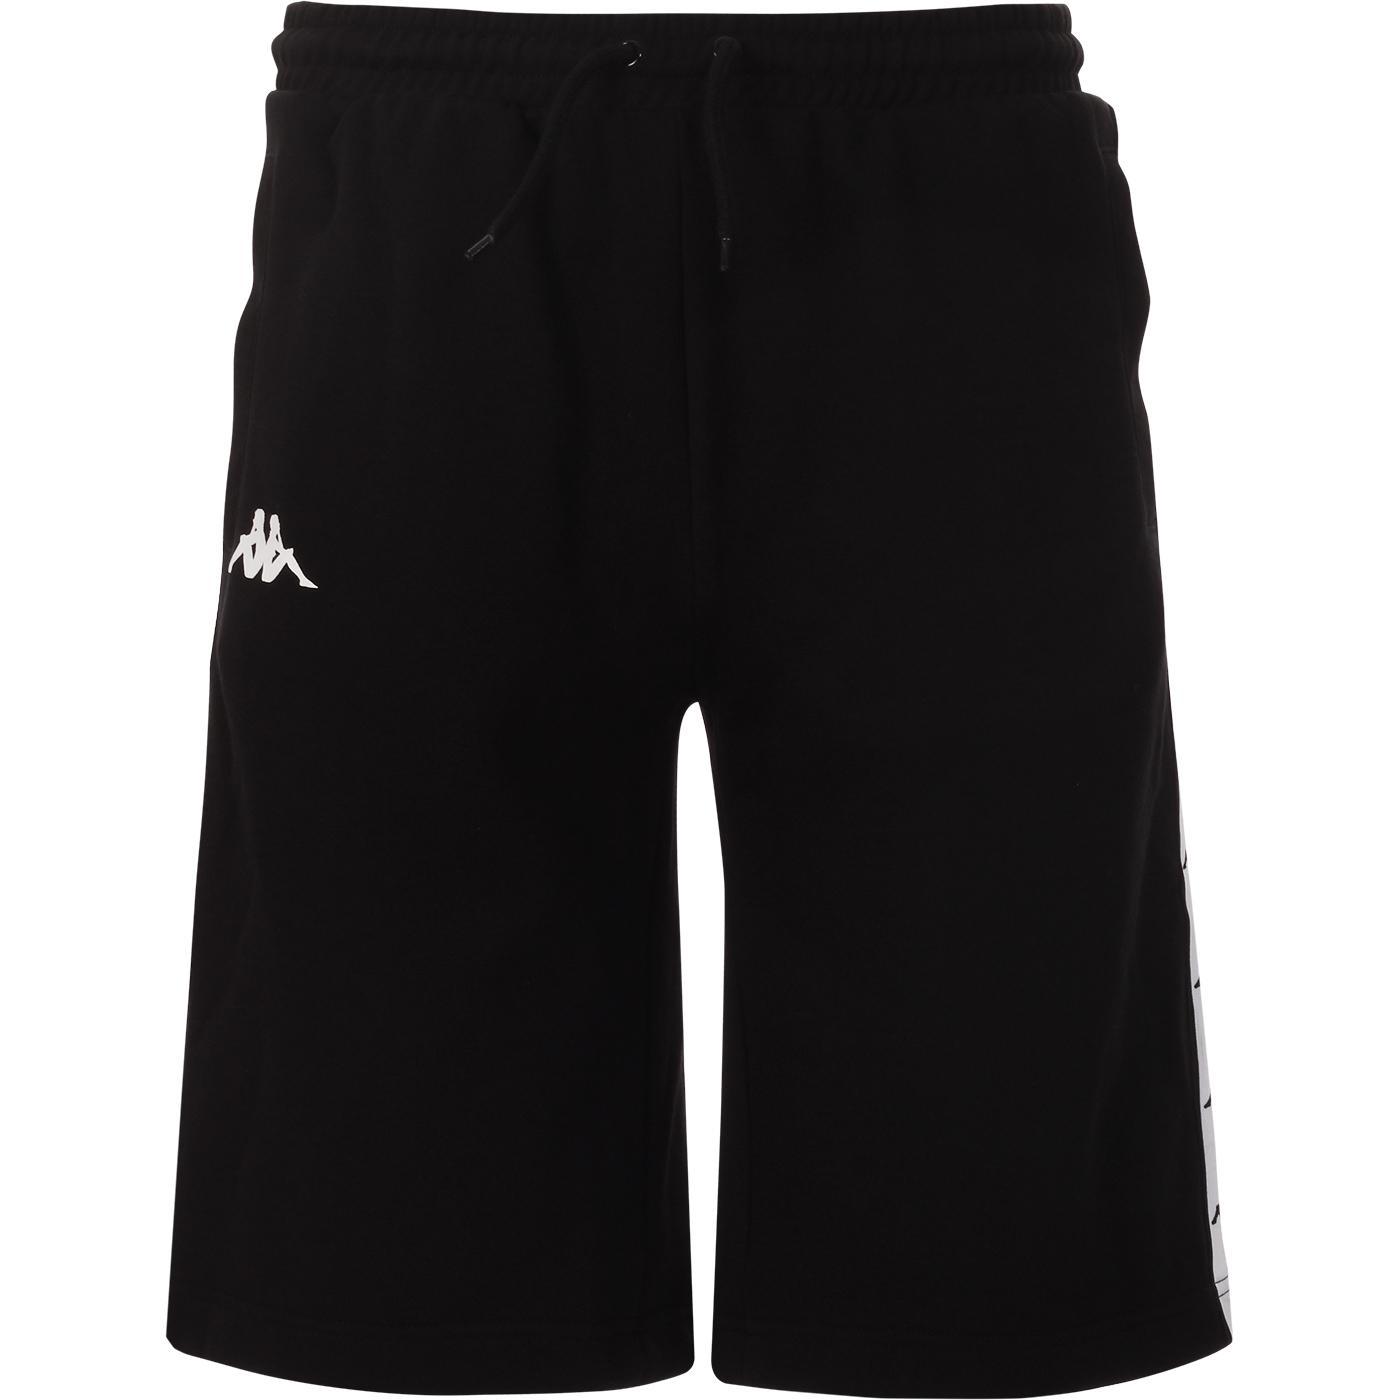 Tunner KAPPA 90s Mid Length Wide Cut Shorts (B/W)